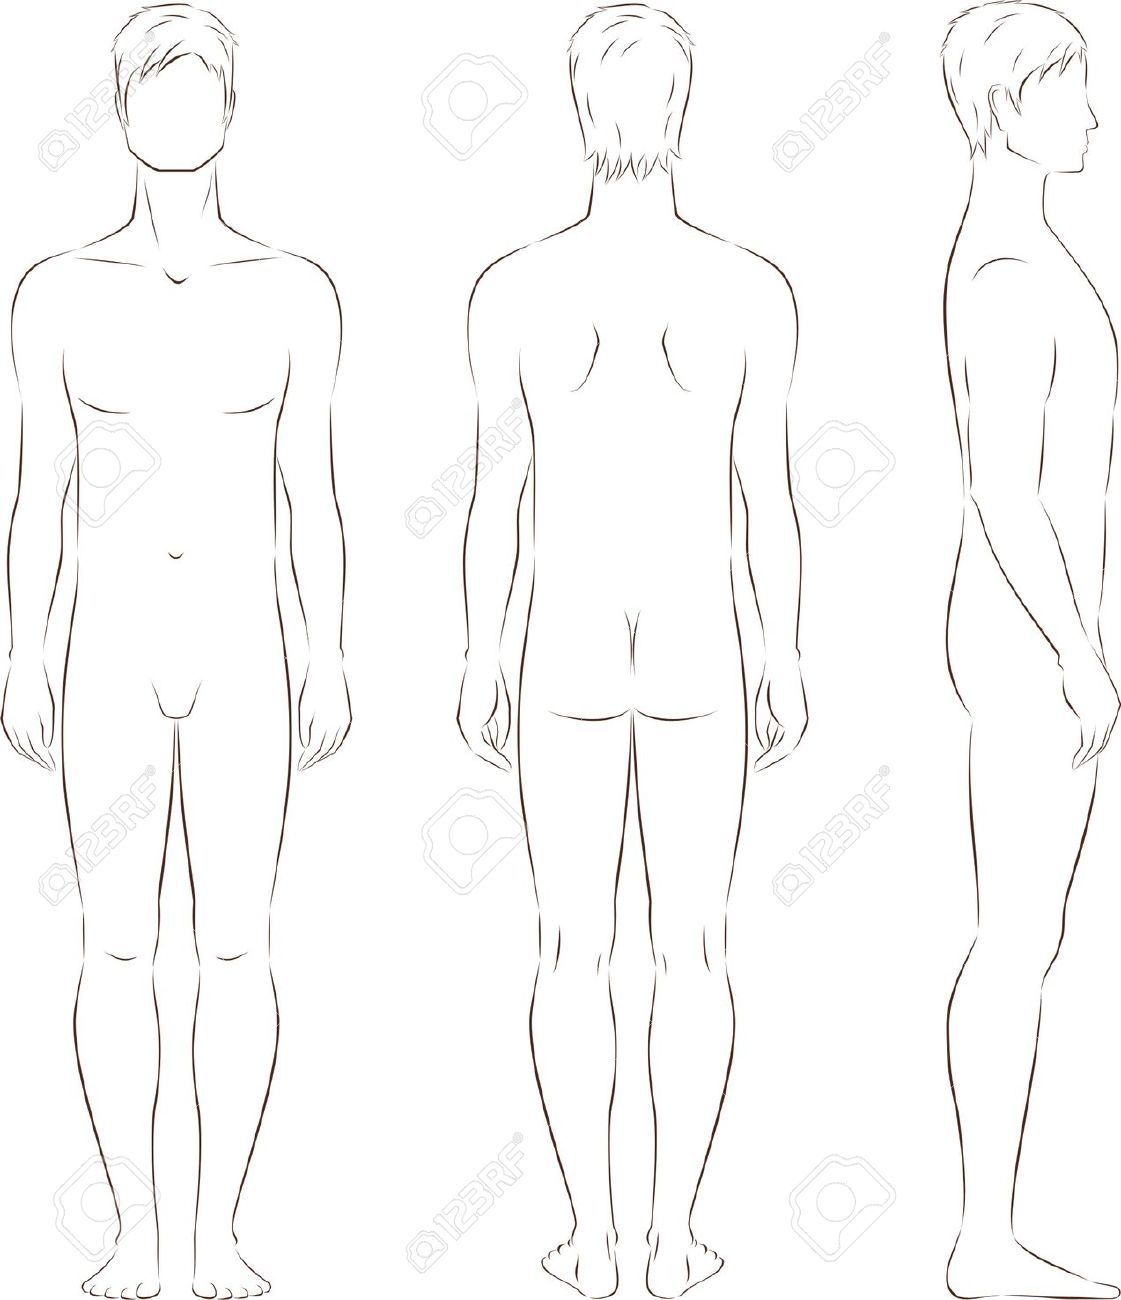 Dessin De Mode Silhouette Homme Recherche Google Figurines De